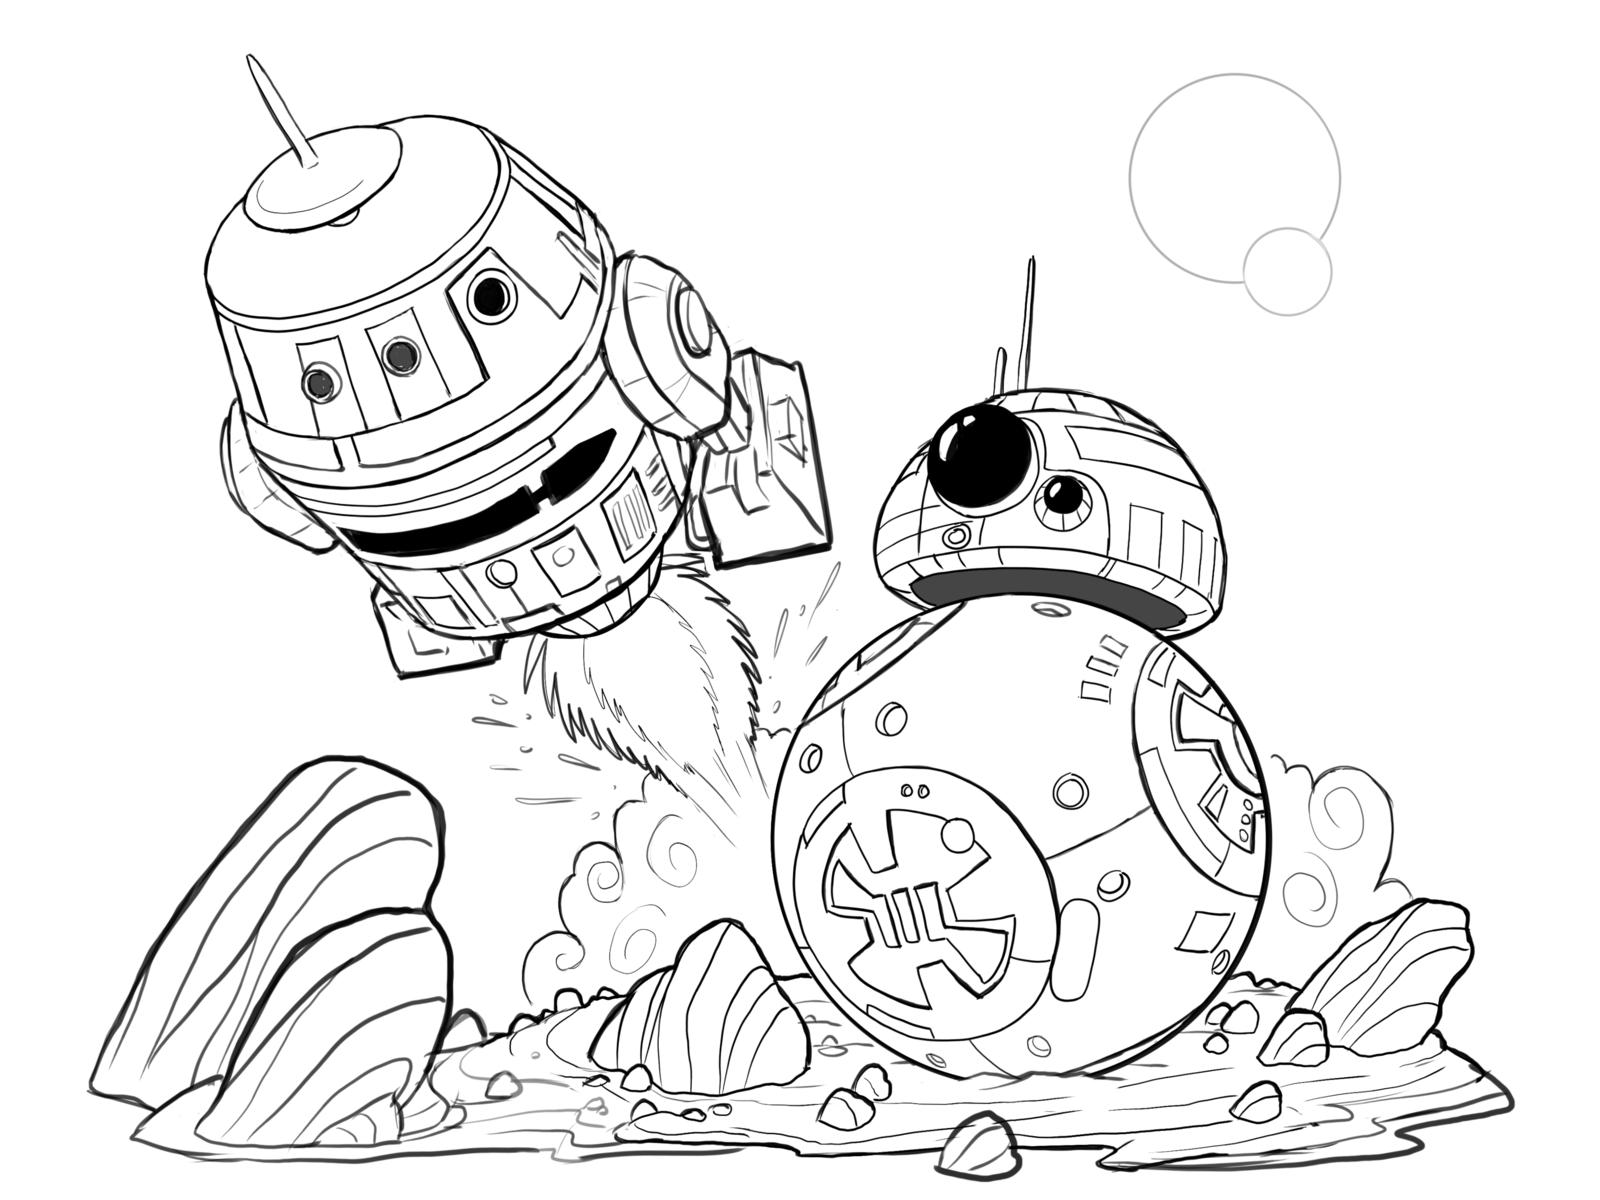 Hera And Chopper Star Wars Rebels Wip By Cartoonstudy On